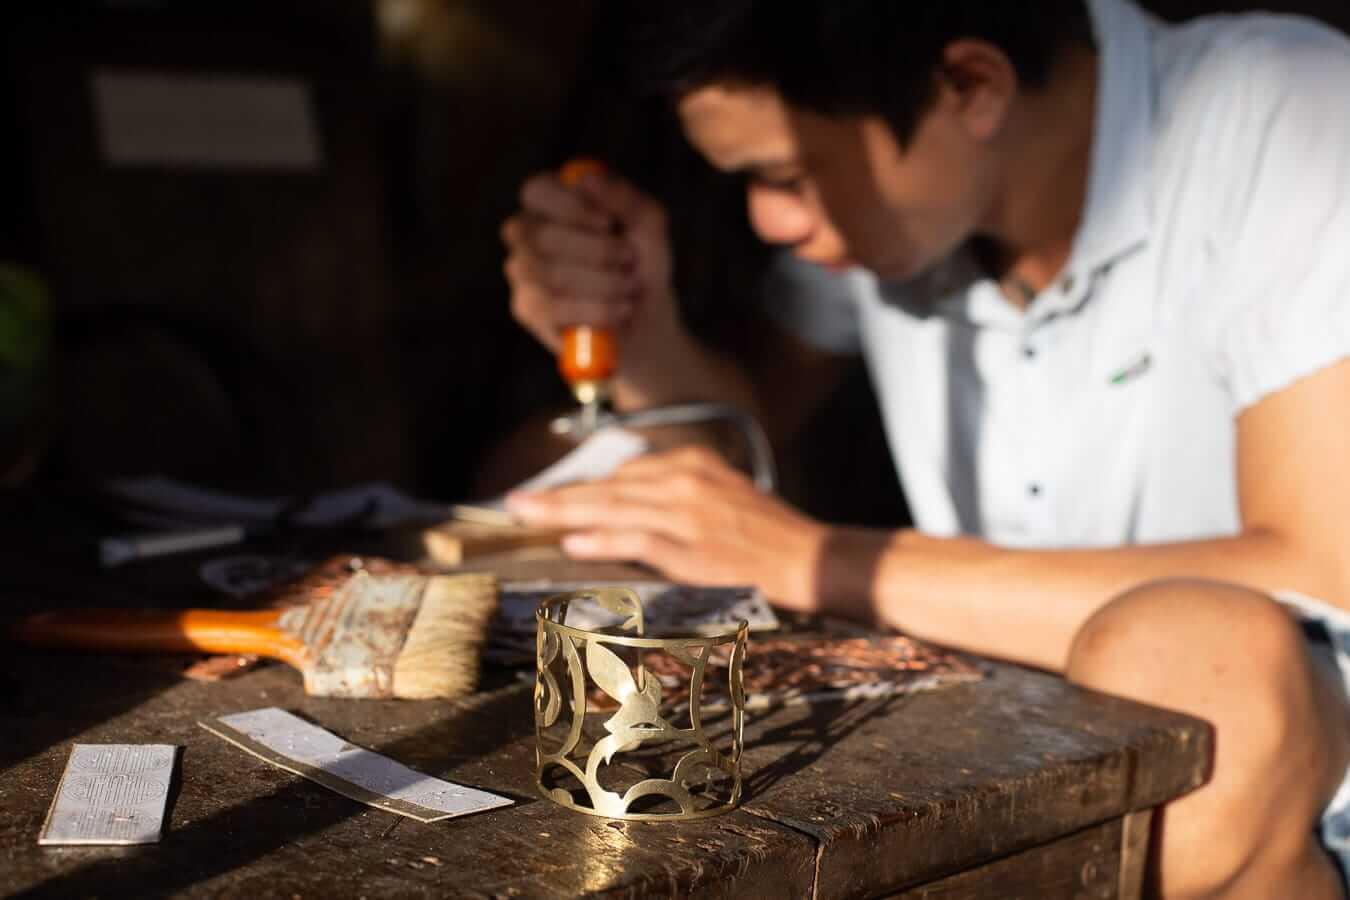 Working craftsman: Hoi An souvenirs